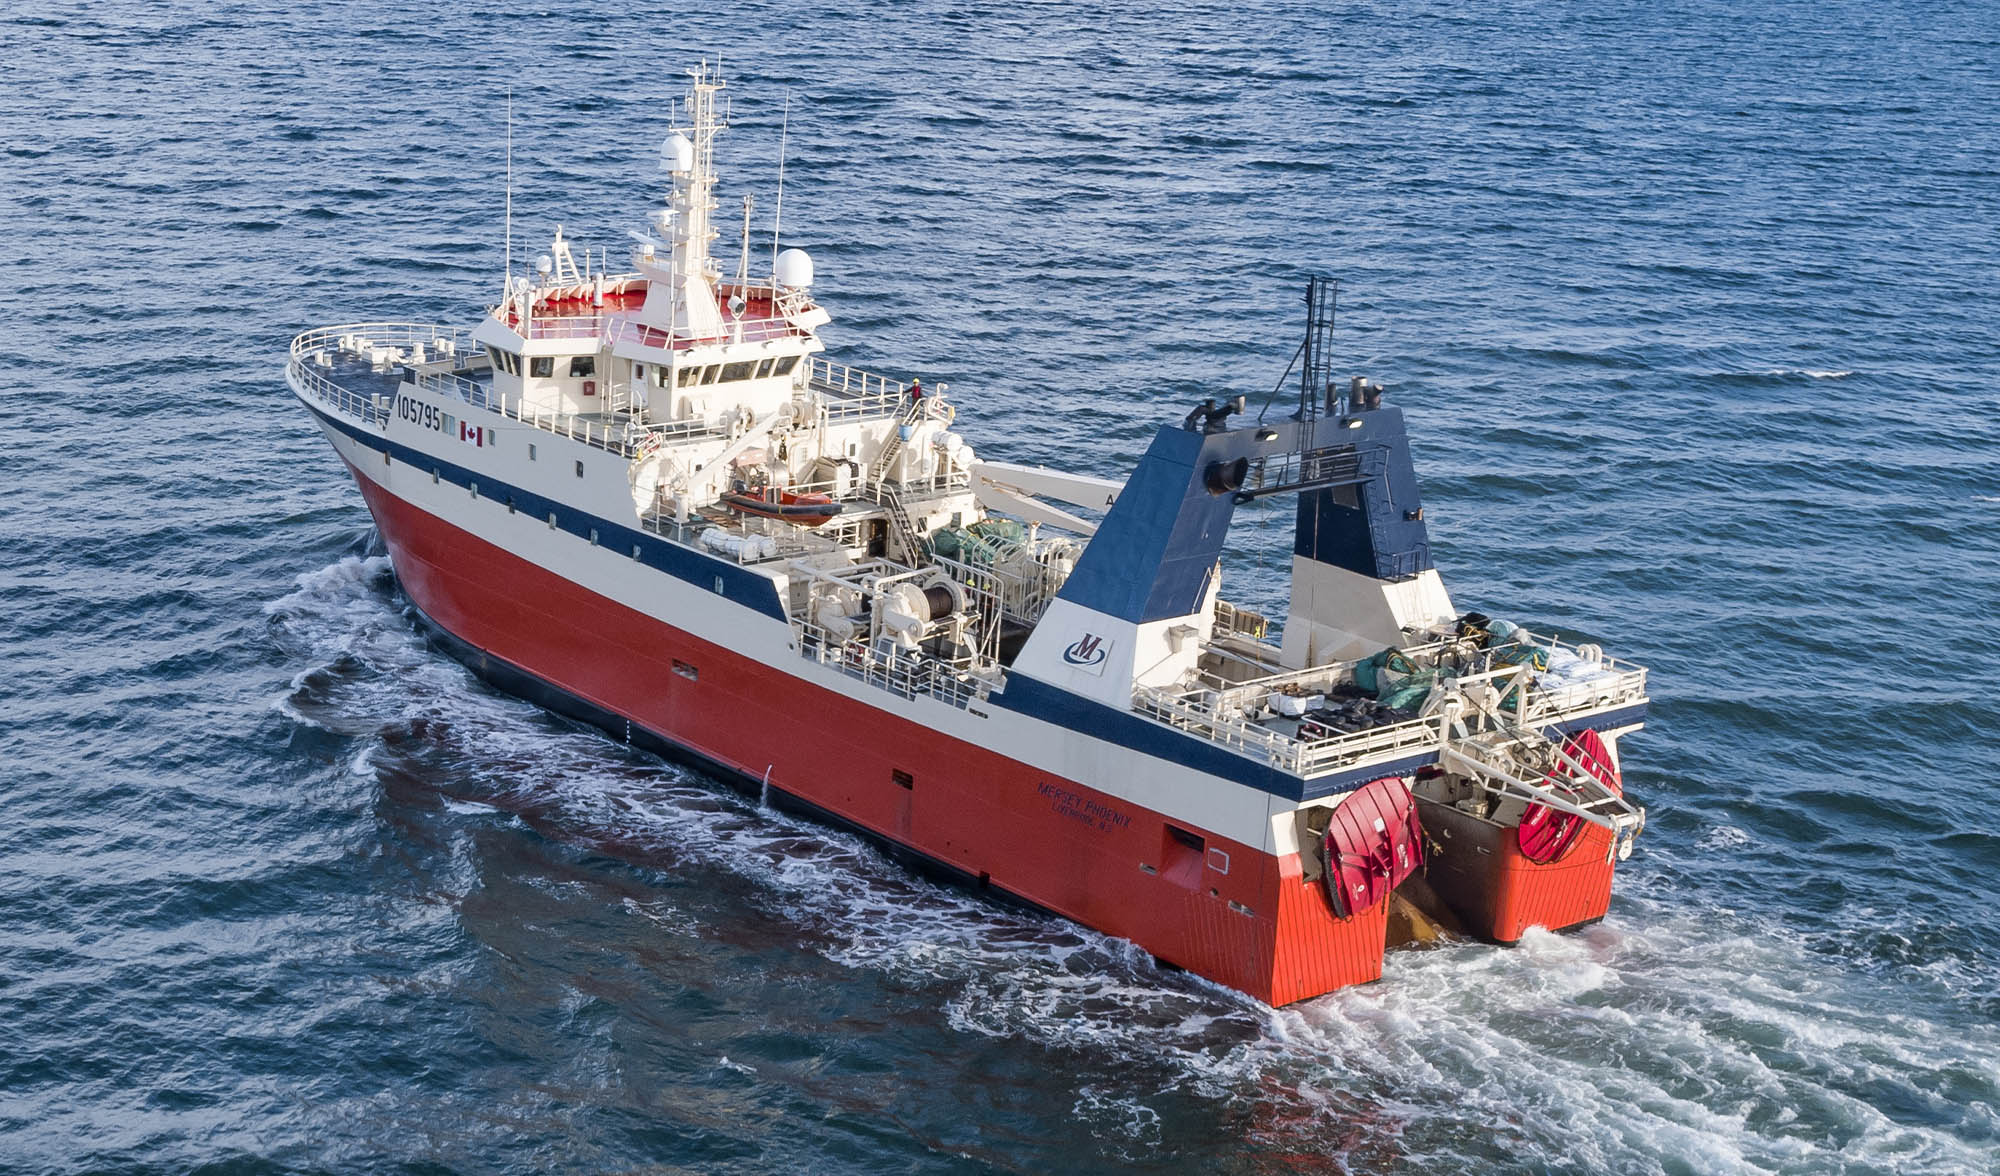 Mersey Phoenix at sea